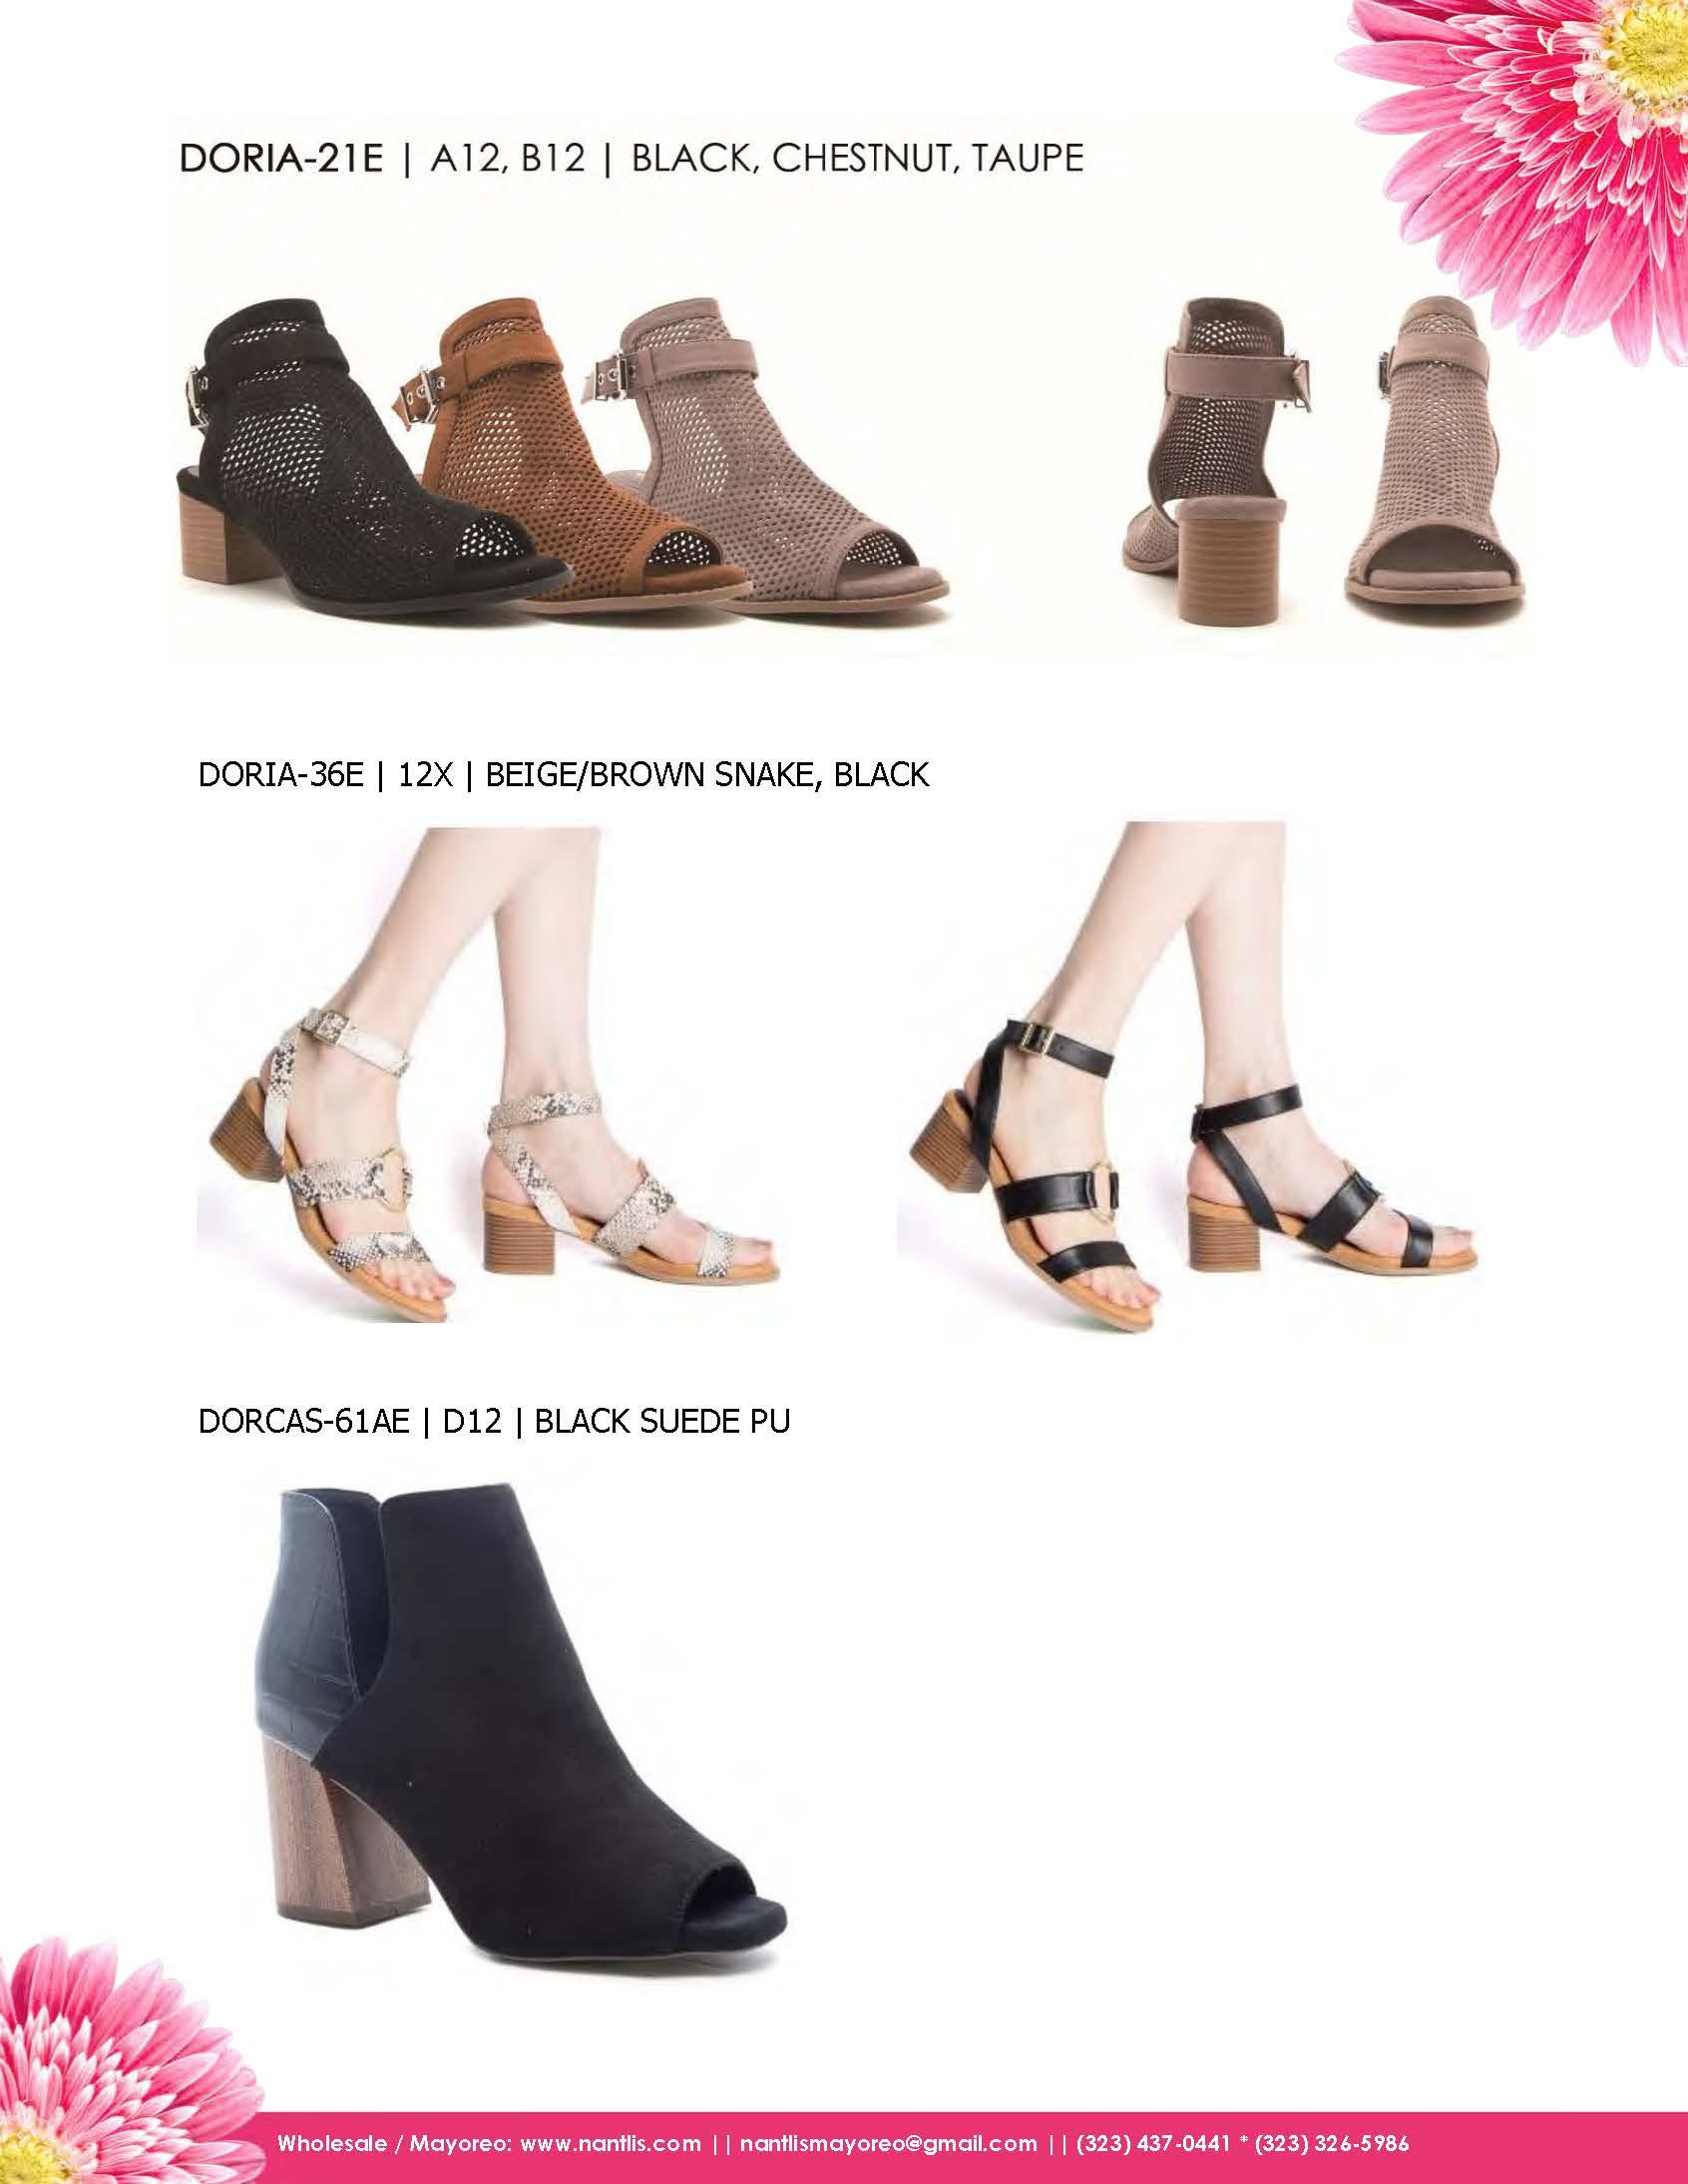 Nantlis Vol QU43 Zapatos para mujer mayoreo Wholesale shoes for women_Page_20